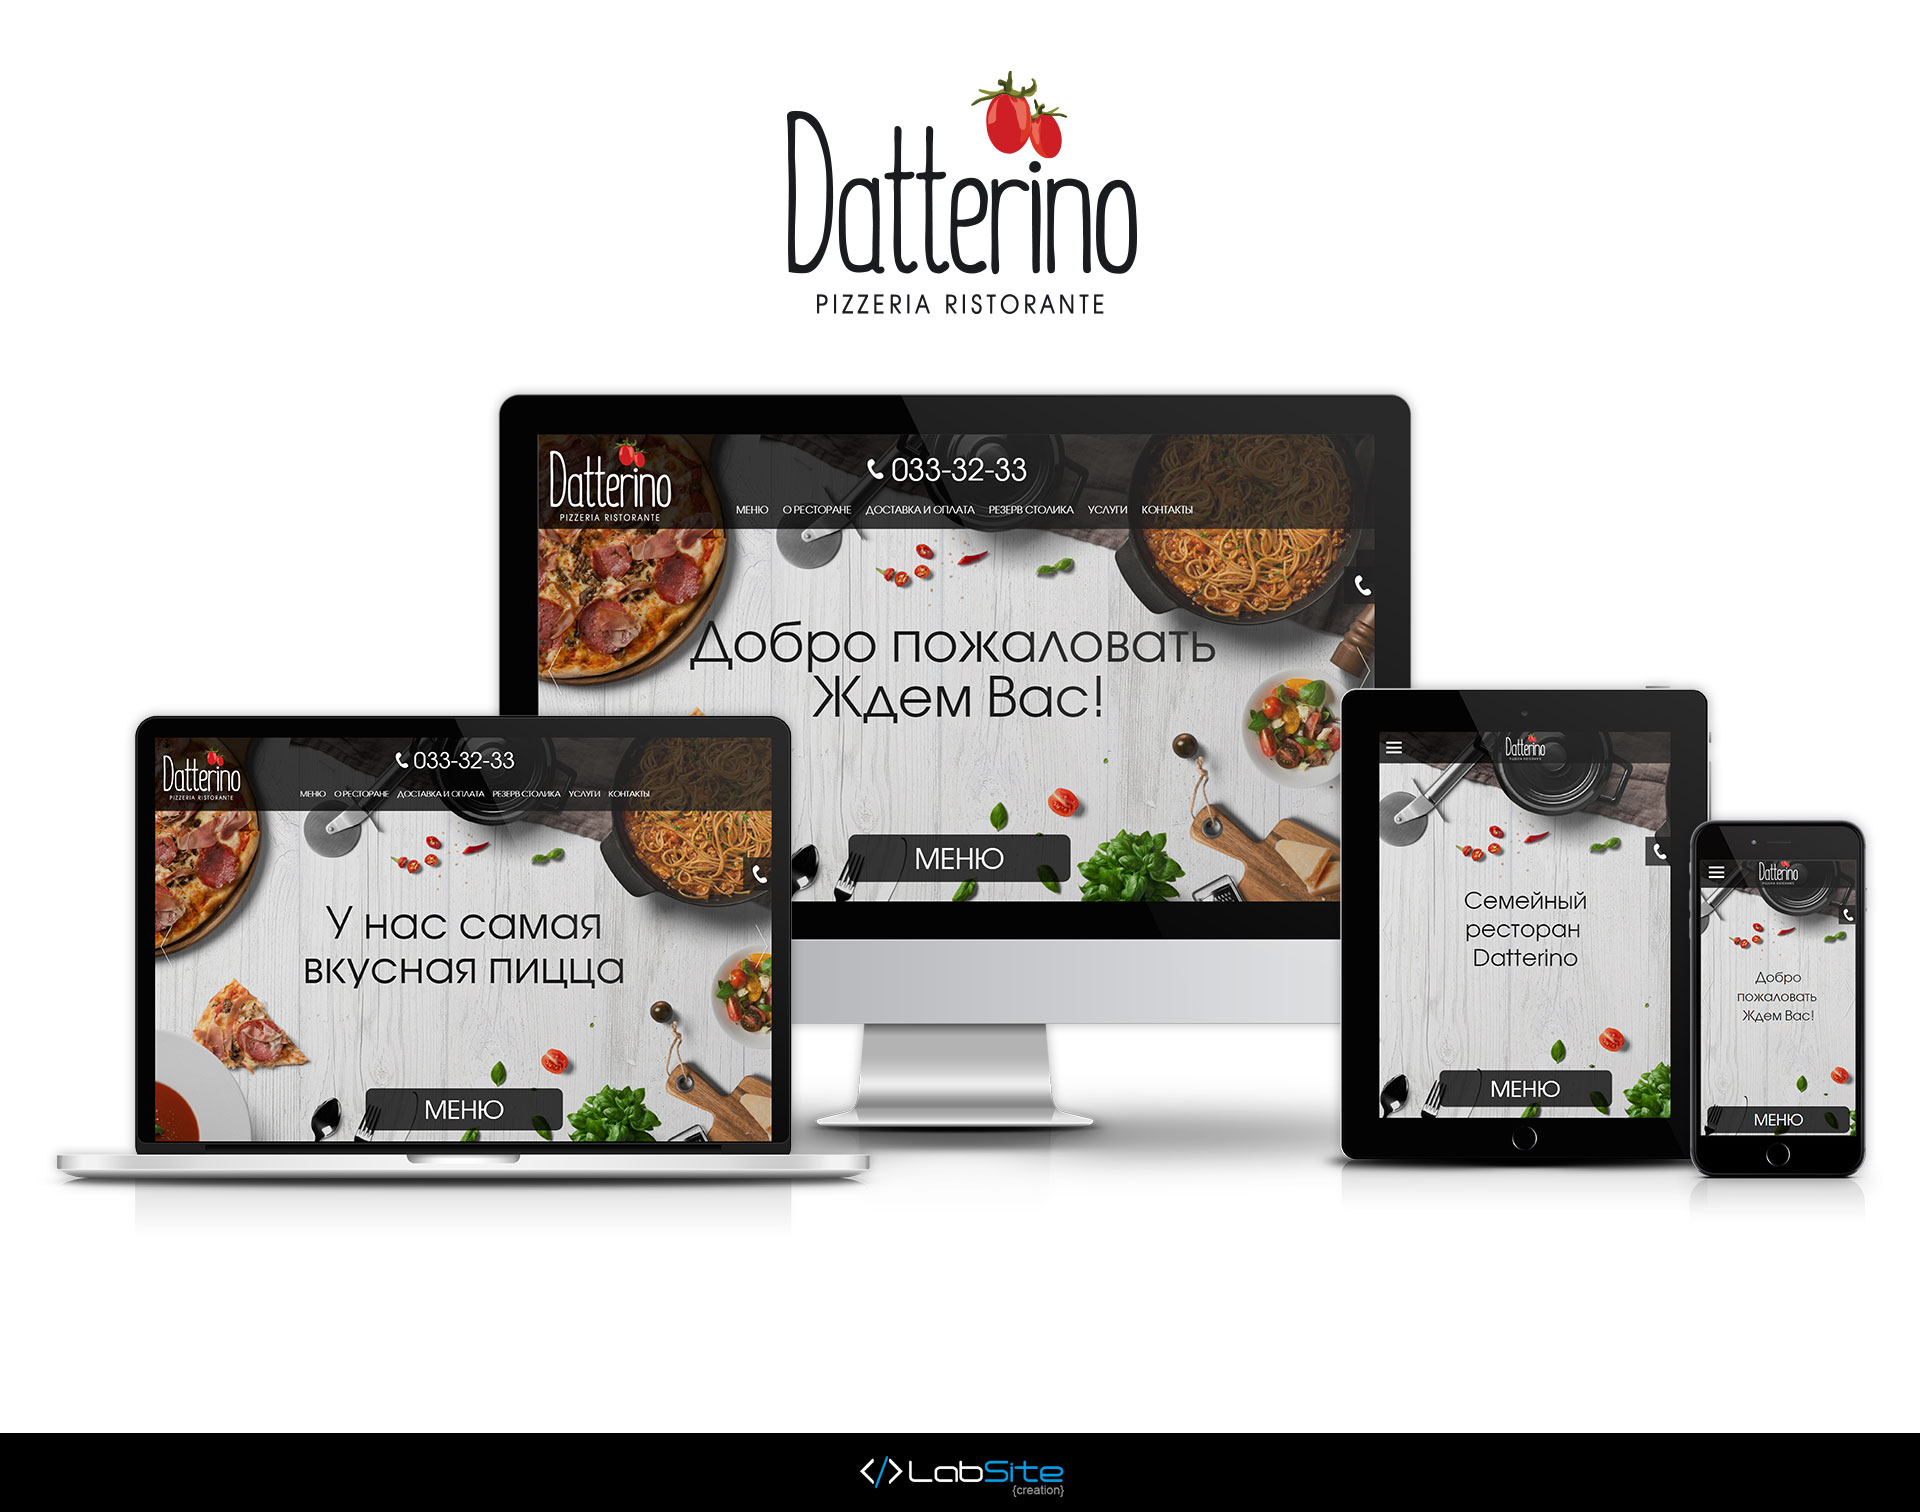 Фото Дизайн и разработка сайта для пиццерии Datterino.  design, html, css, js, php, wordpress